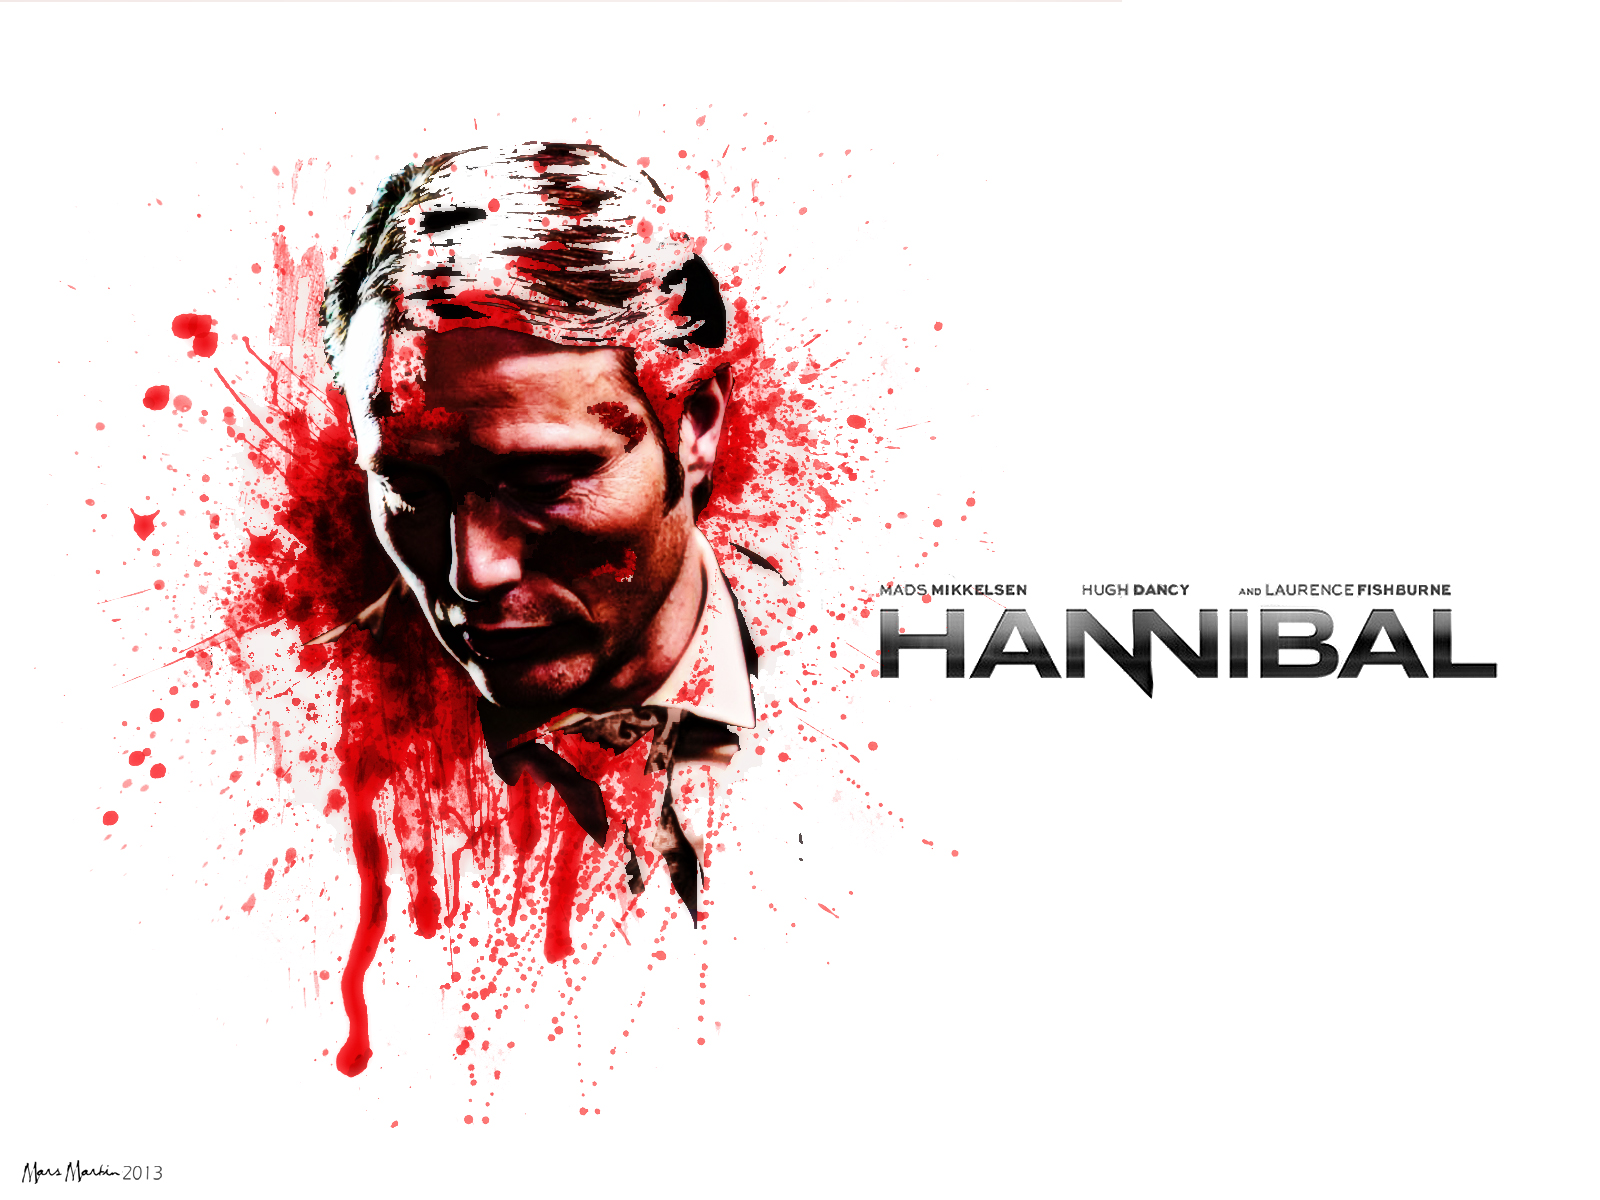 NBC Hannibal Wallpaper By Thecannibalfactory On DeviantArt